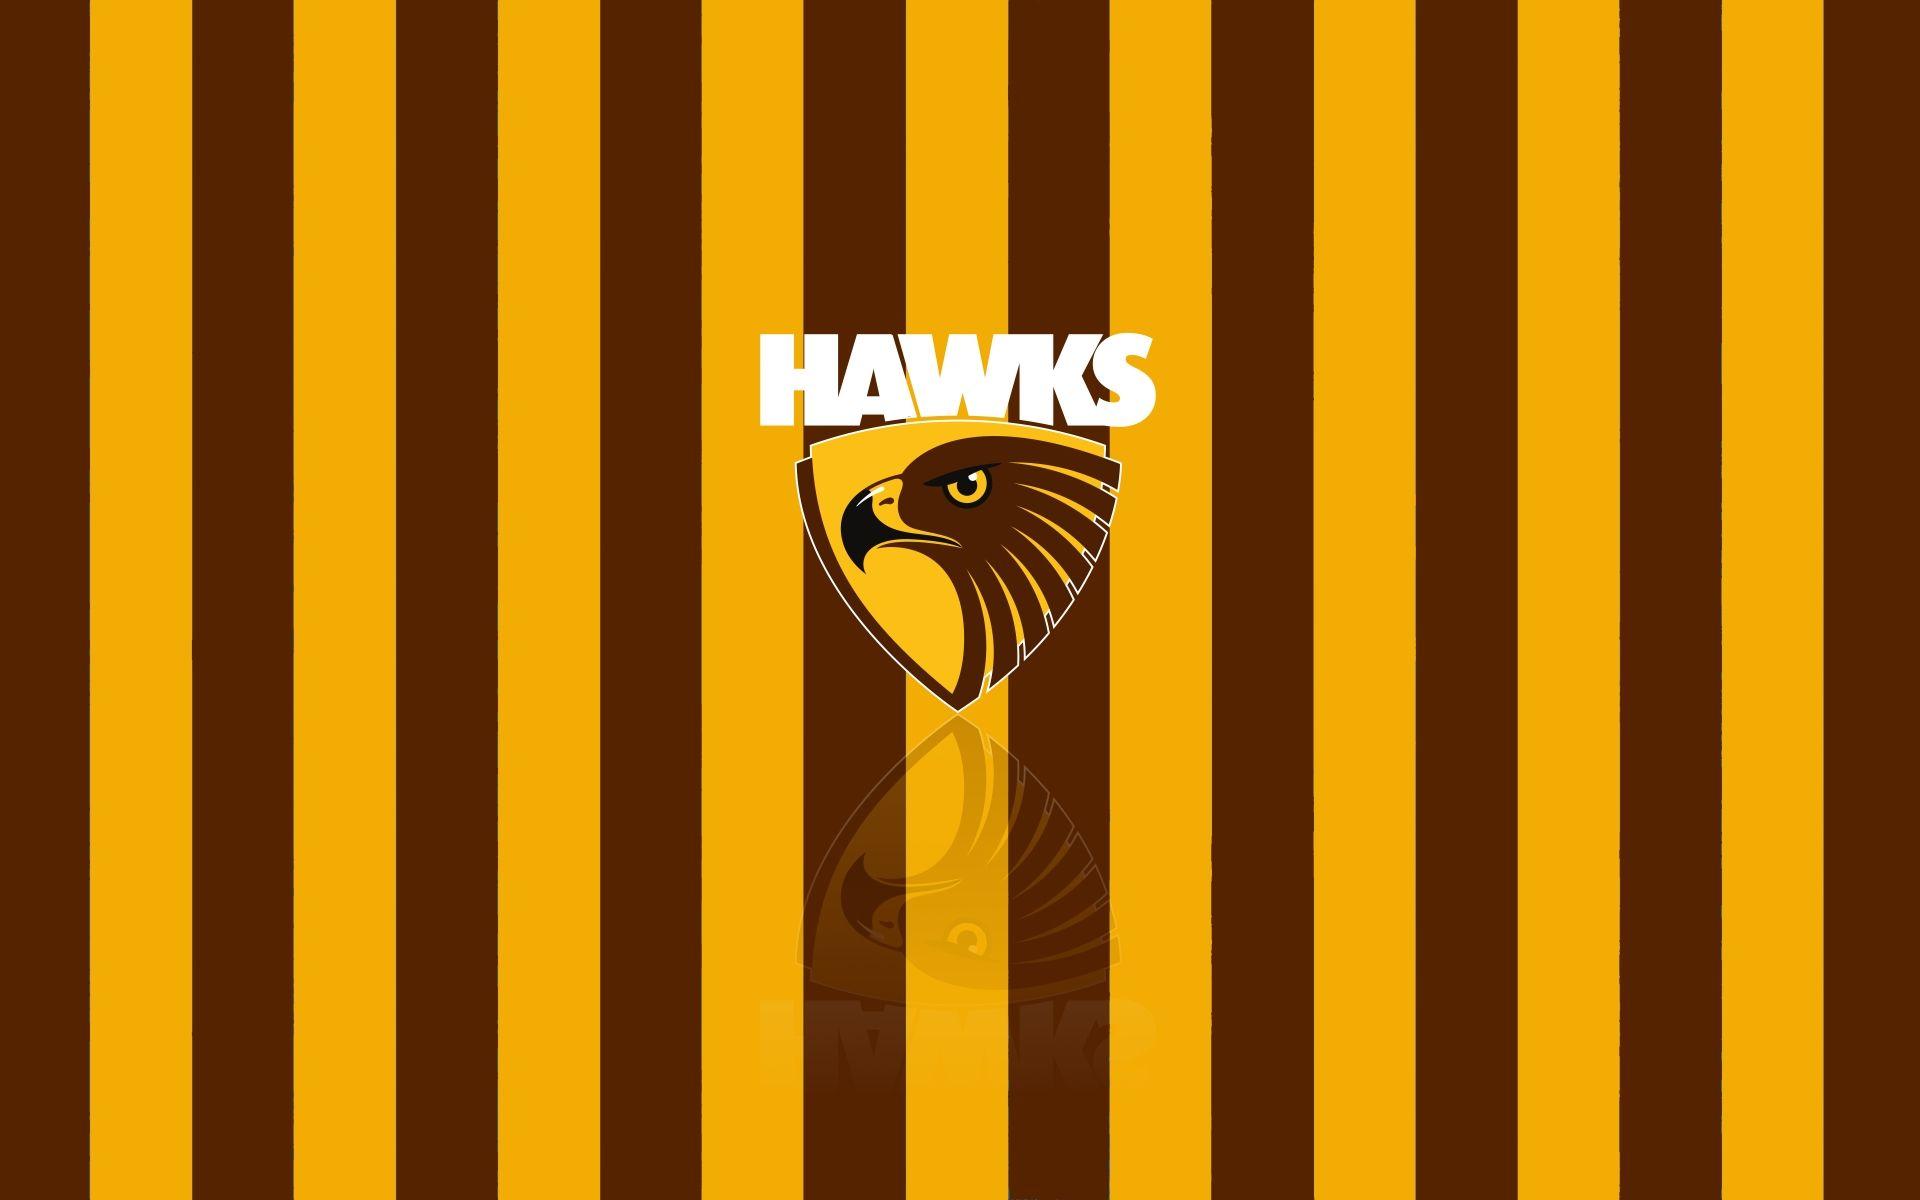 Wallpaper Hawthorn Hawks Pinterest Wallpapers Hawthorn Hawks Hawthorn Football Club Hawks Hawthorn Football Club